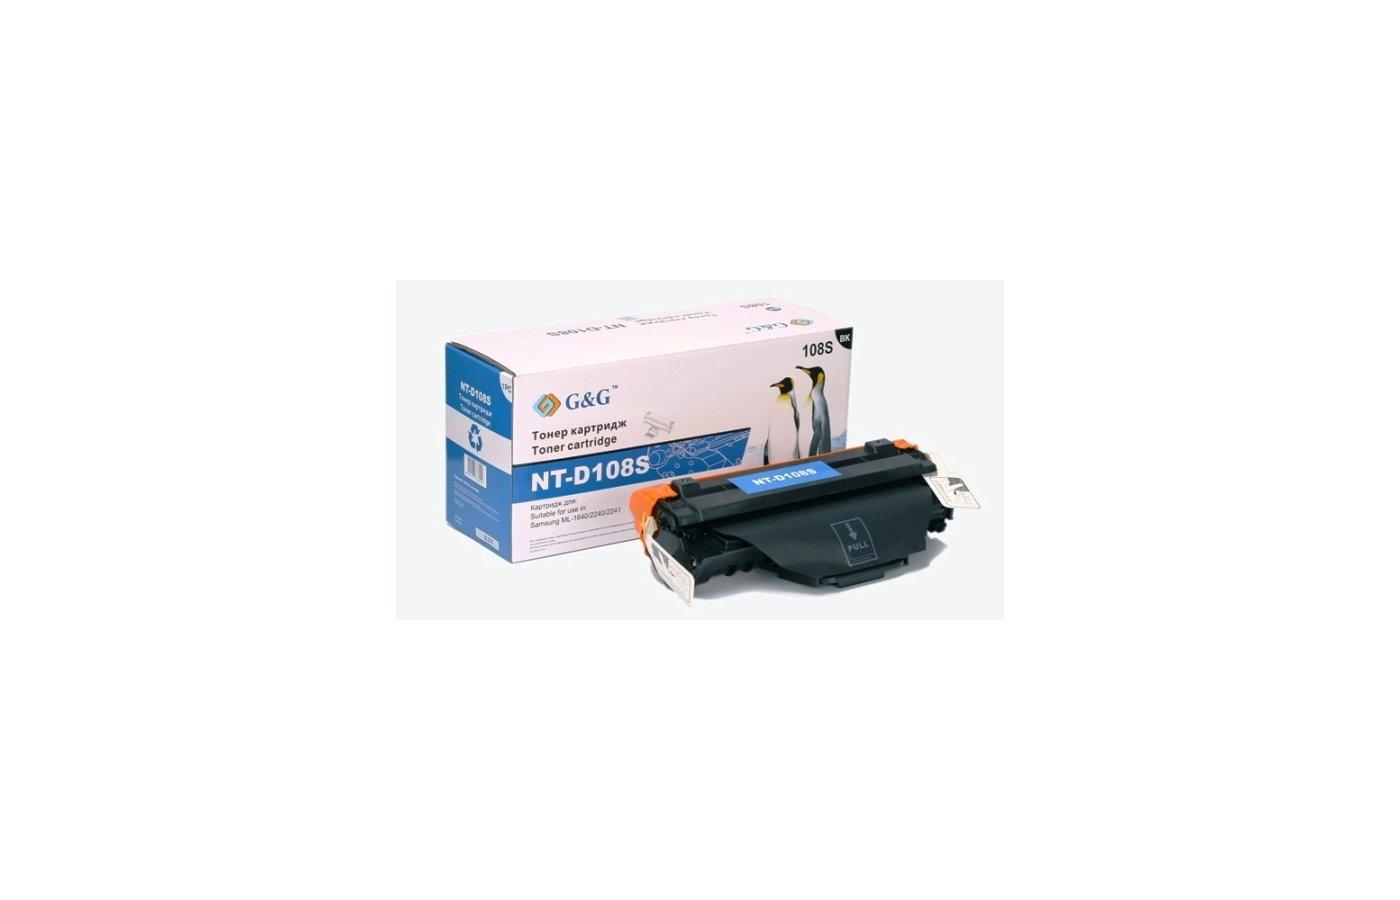 Картридж лазерный GG NT-D108S Совместимый для Samsung ML-1640/2240/2241 (1500стр)